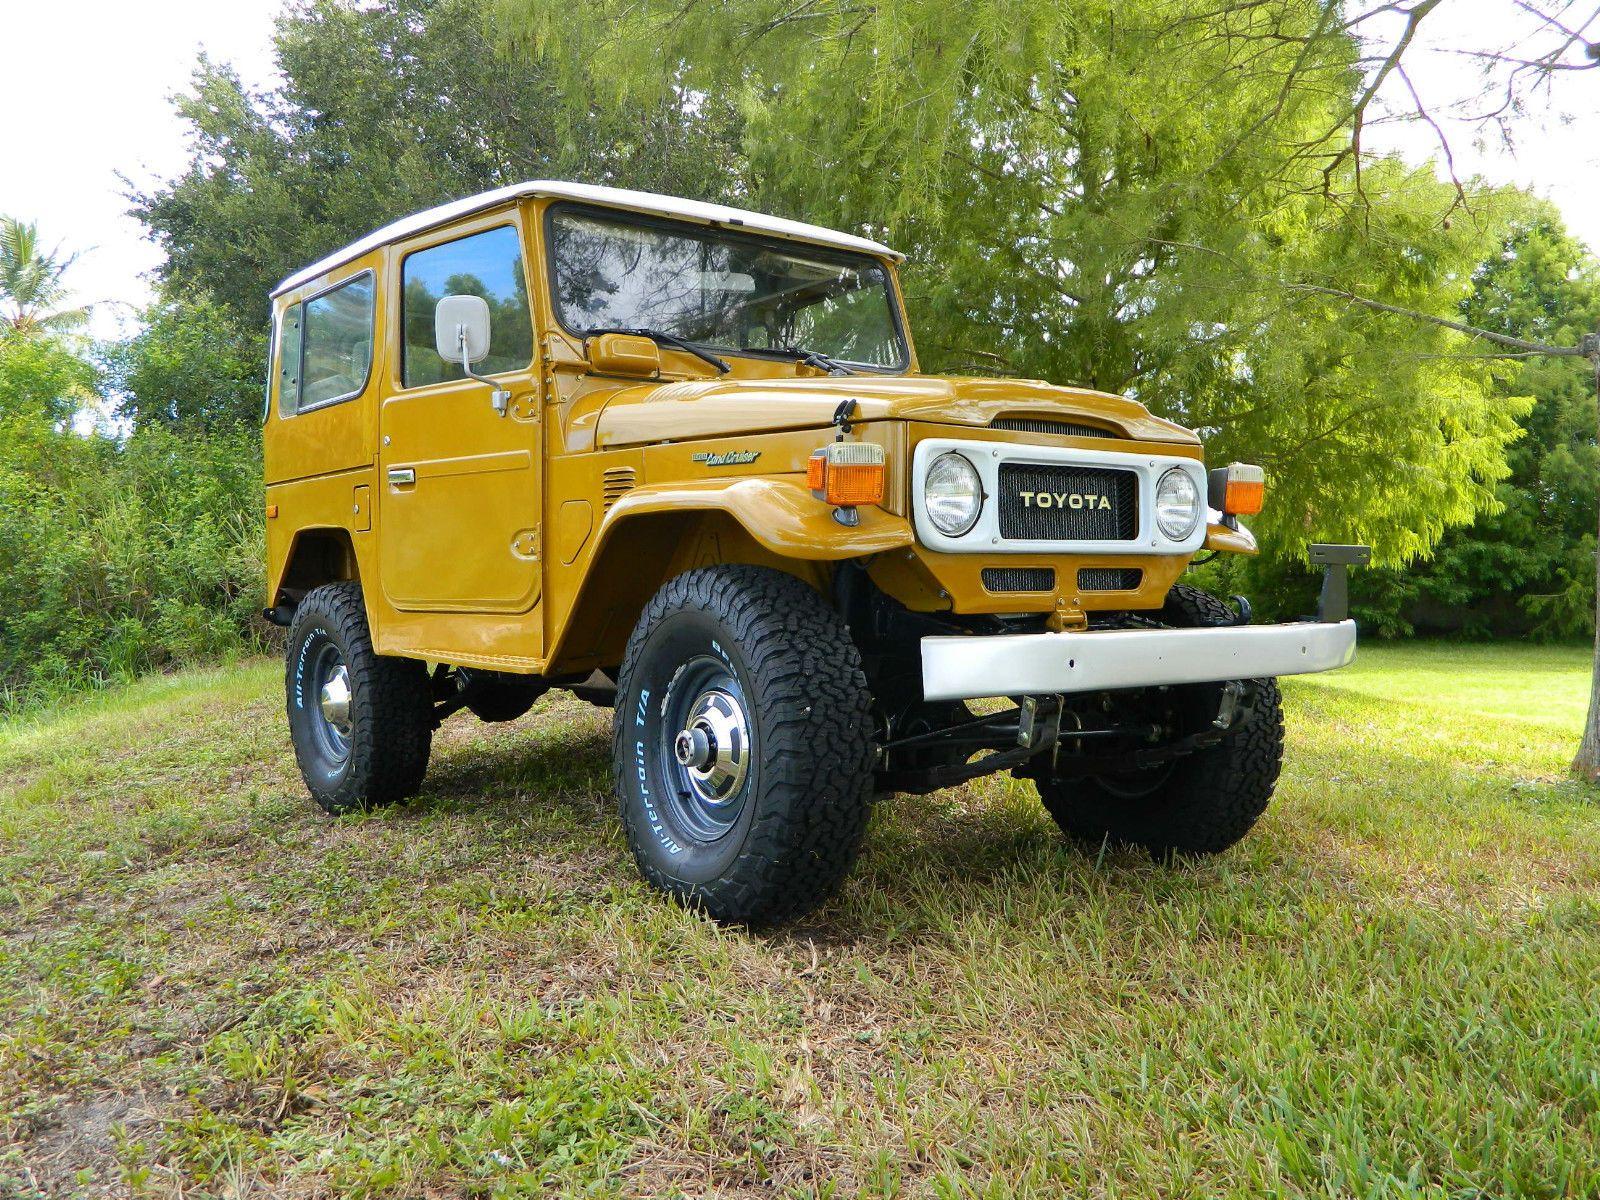 US $28,000.00 Used in eBay Motors, Cars & Trucks, Toyota   Toyota ...